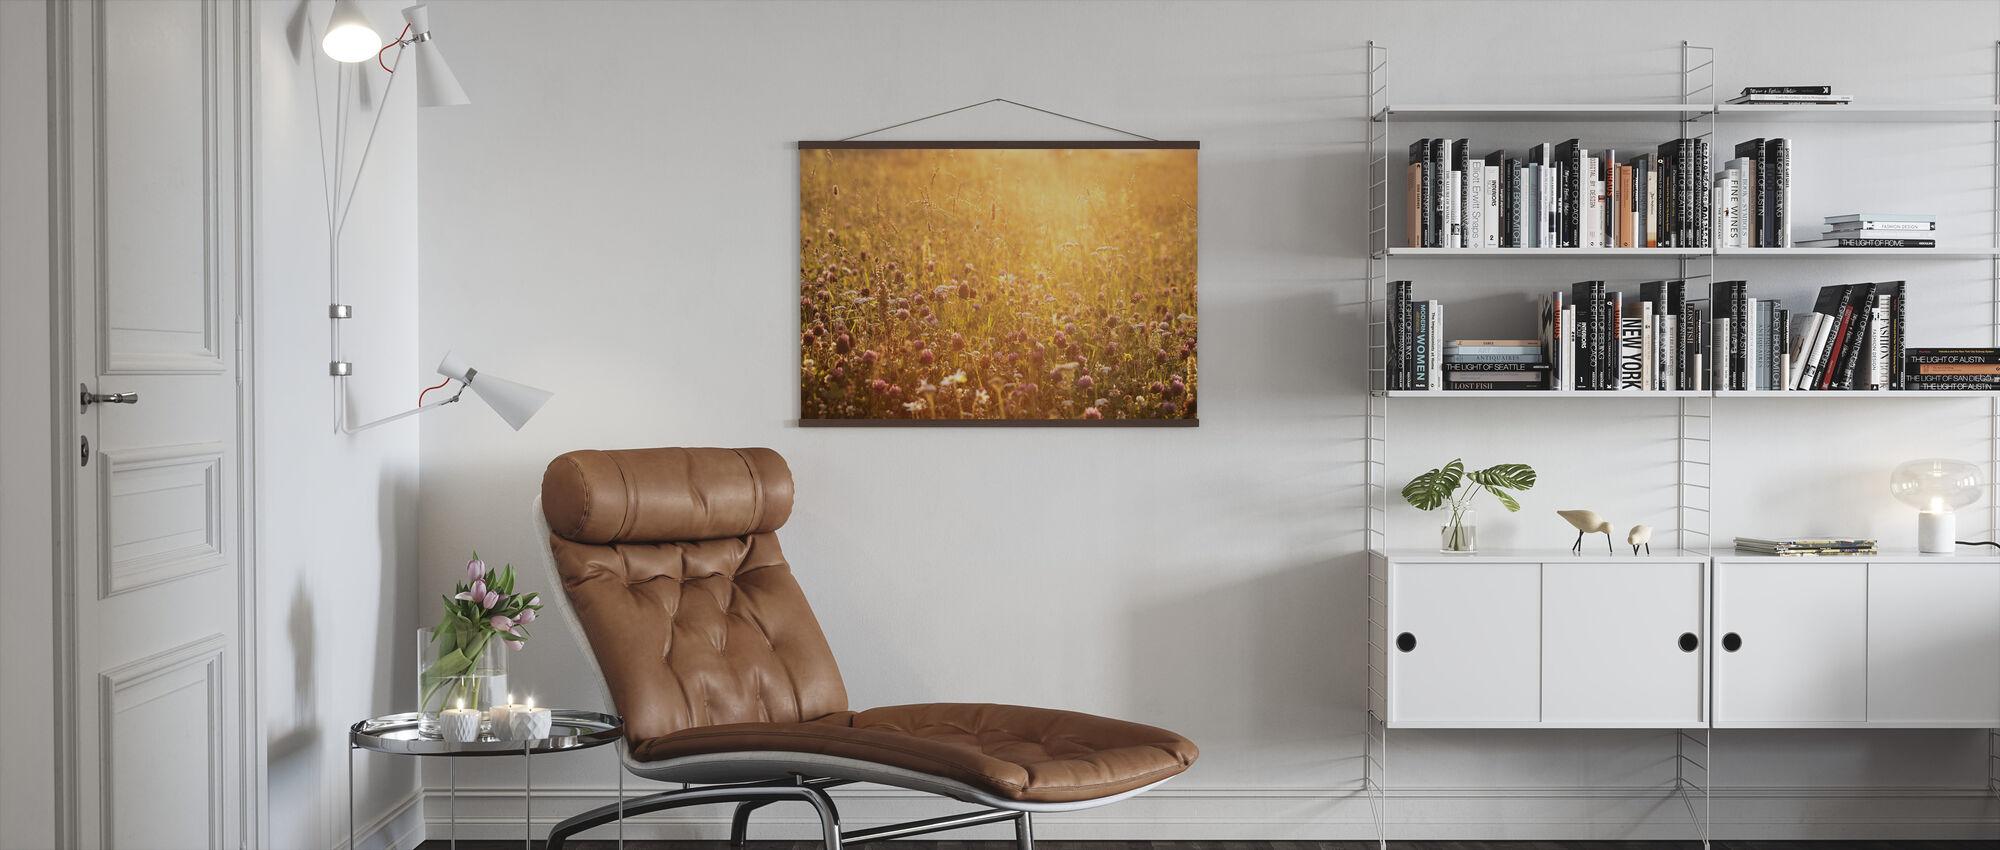 Evening Clover - Poster - Living Room